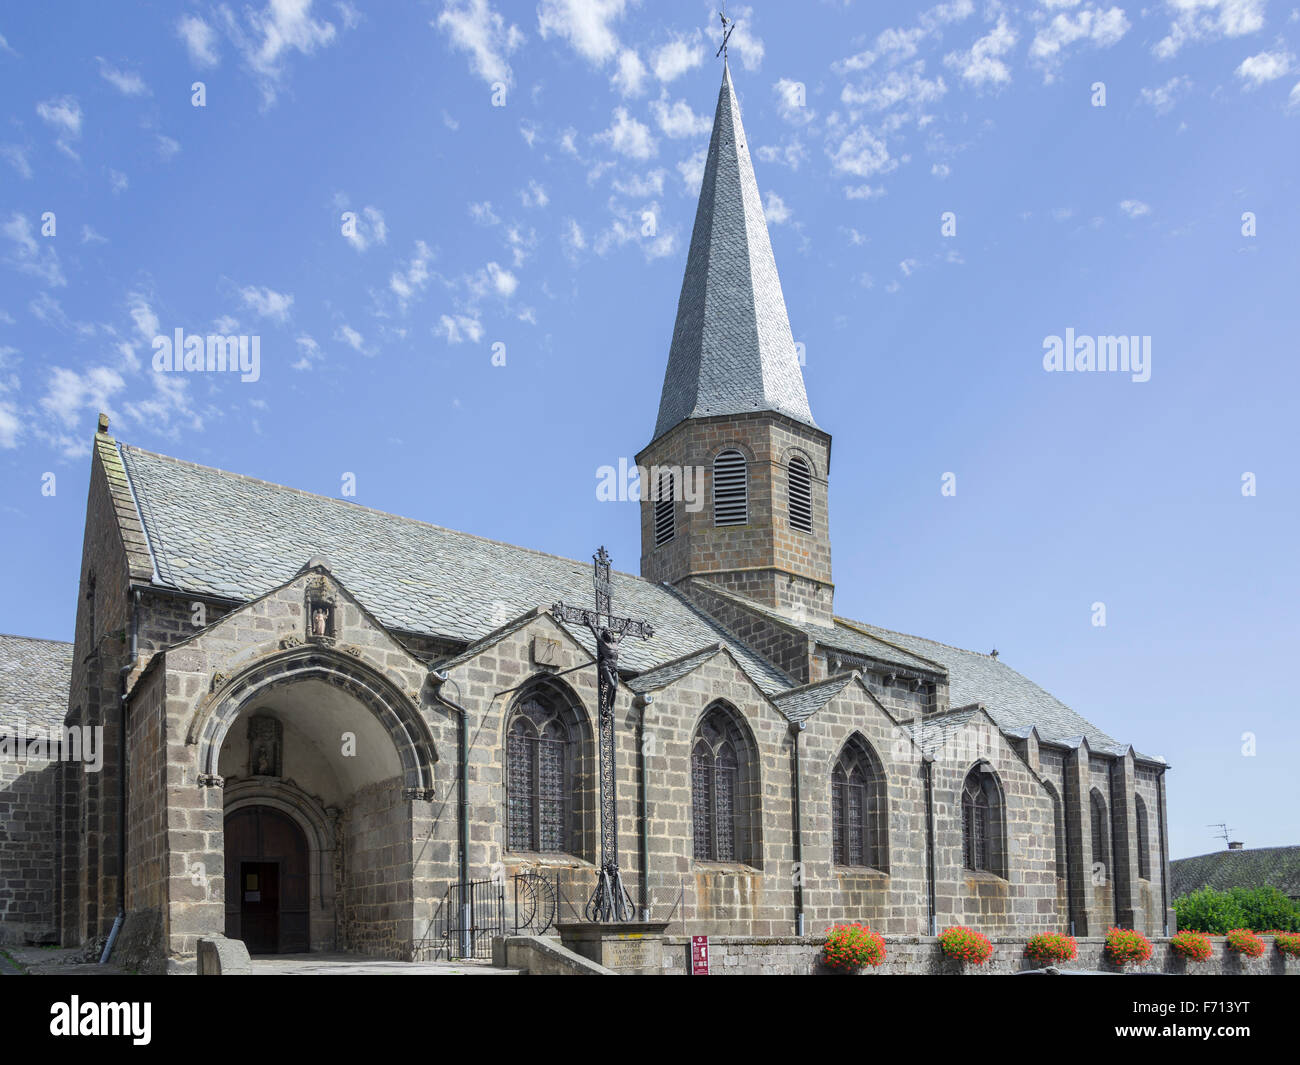 Church, Besse-et-Saint-Anastaise, Auvergne, France - Stock Image